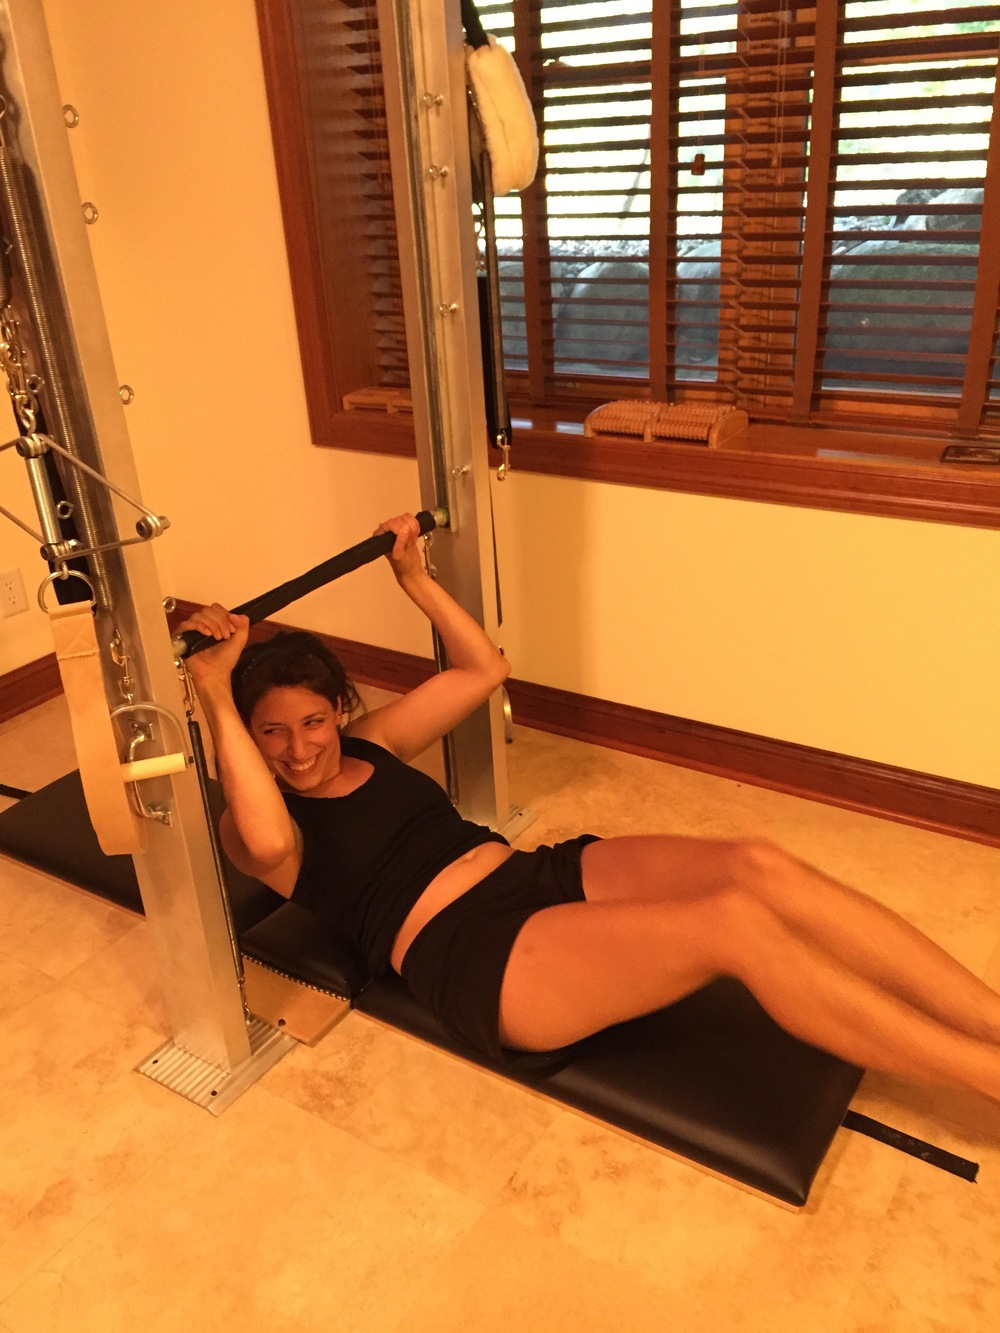 Having fun at Mogo Pilates